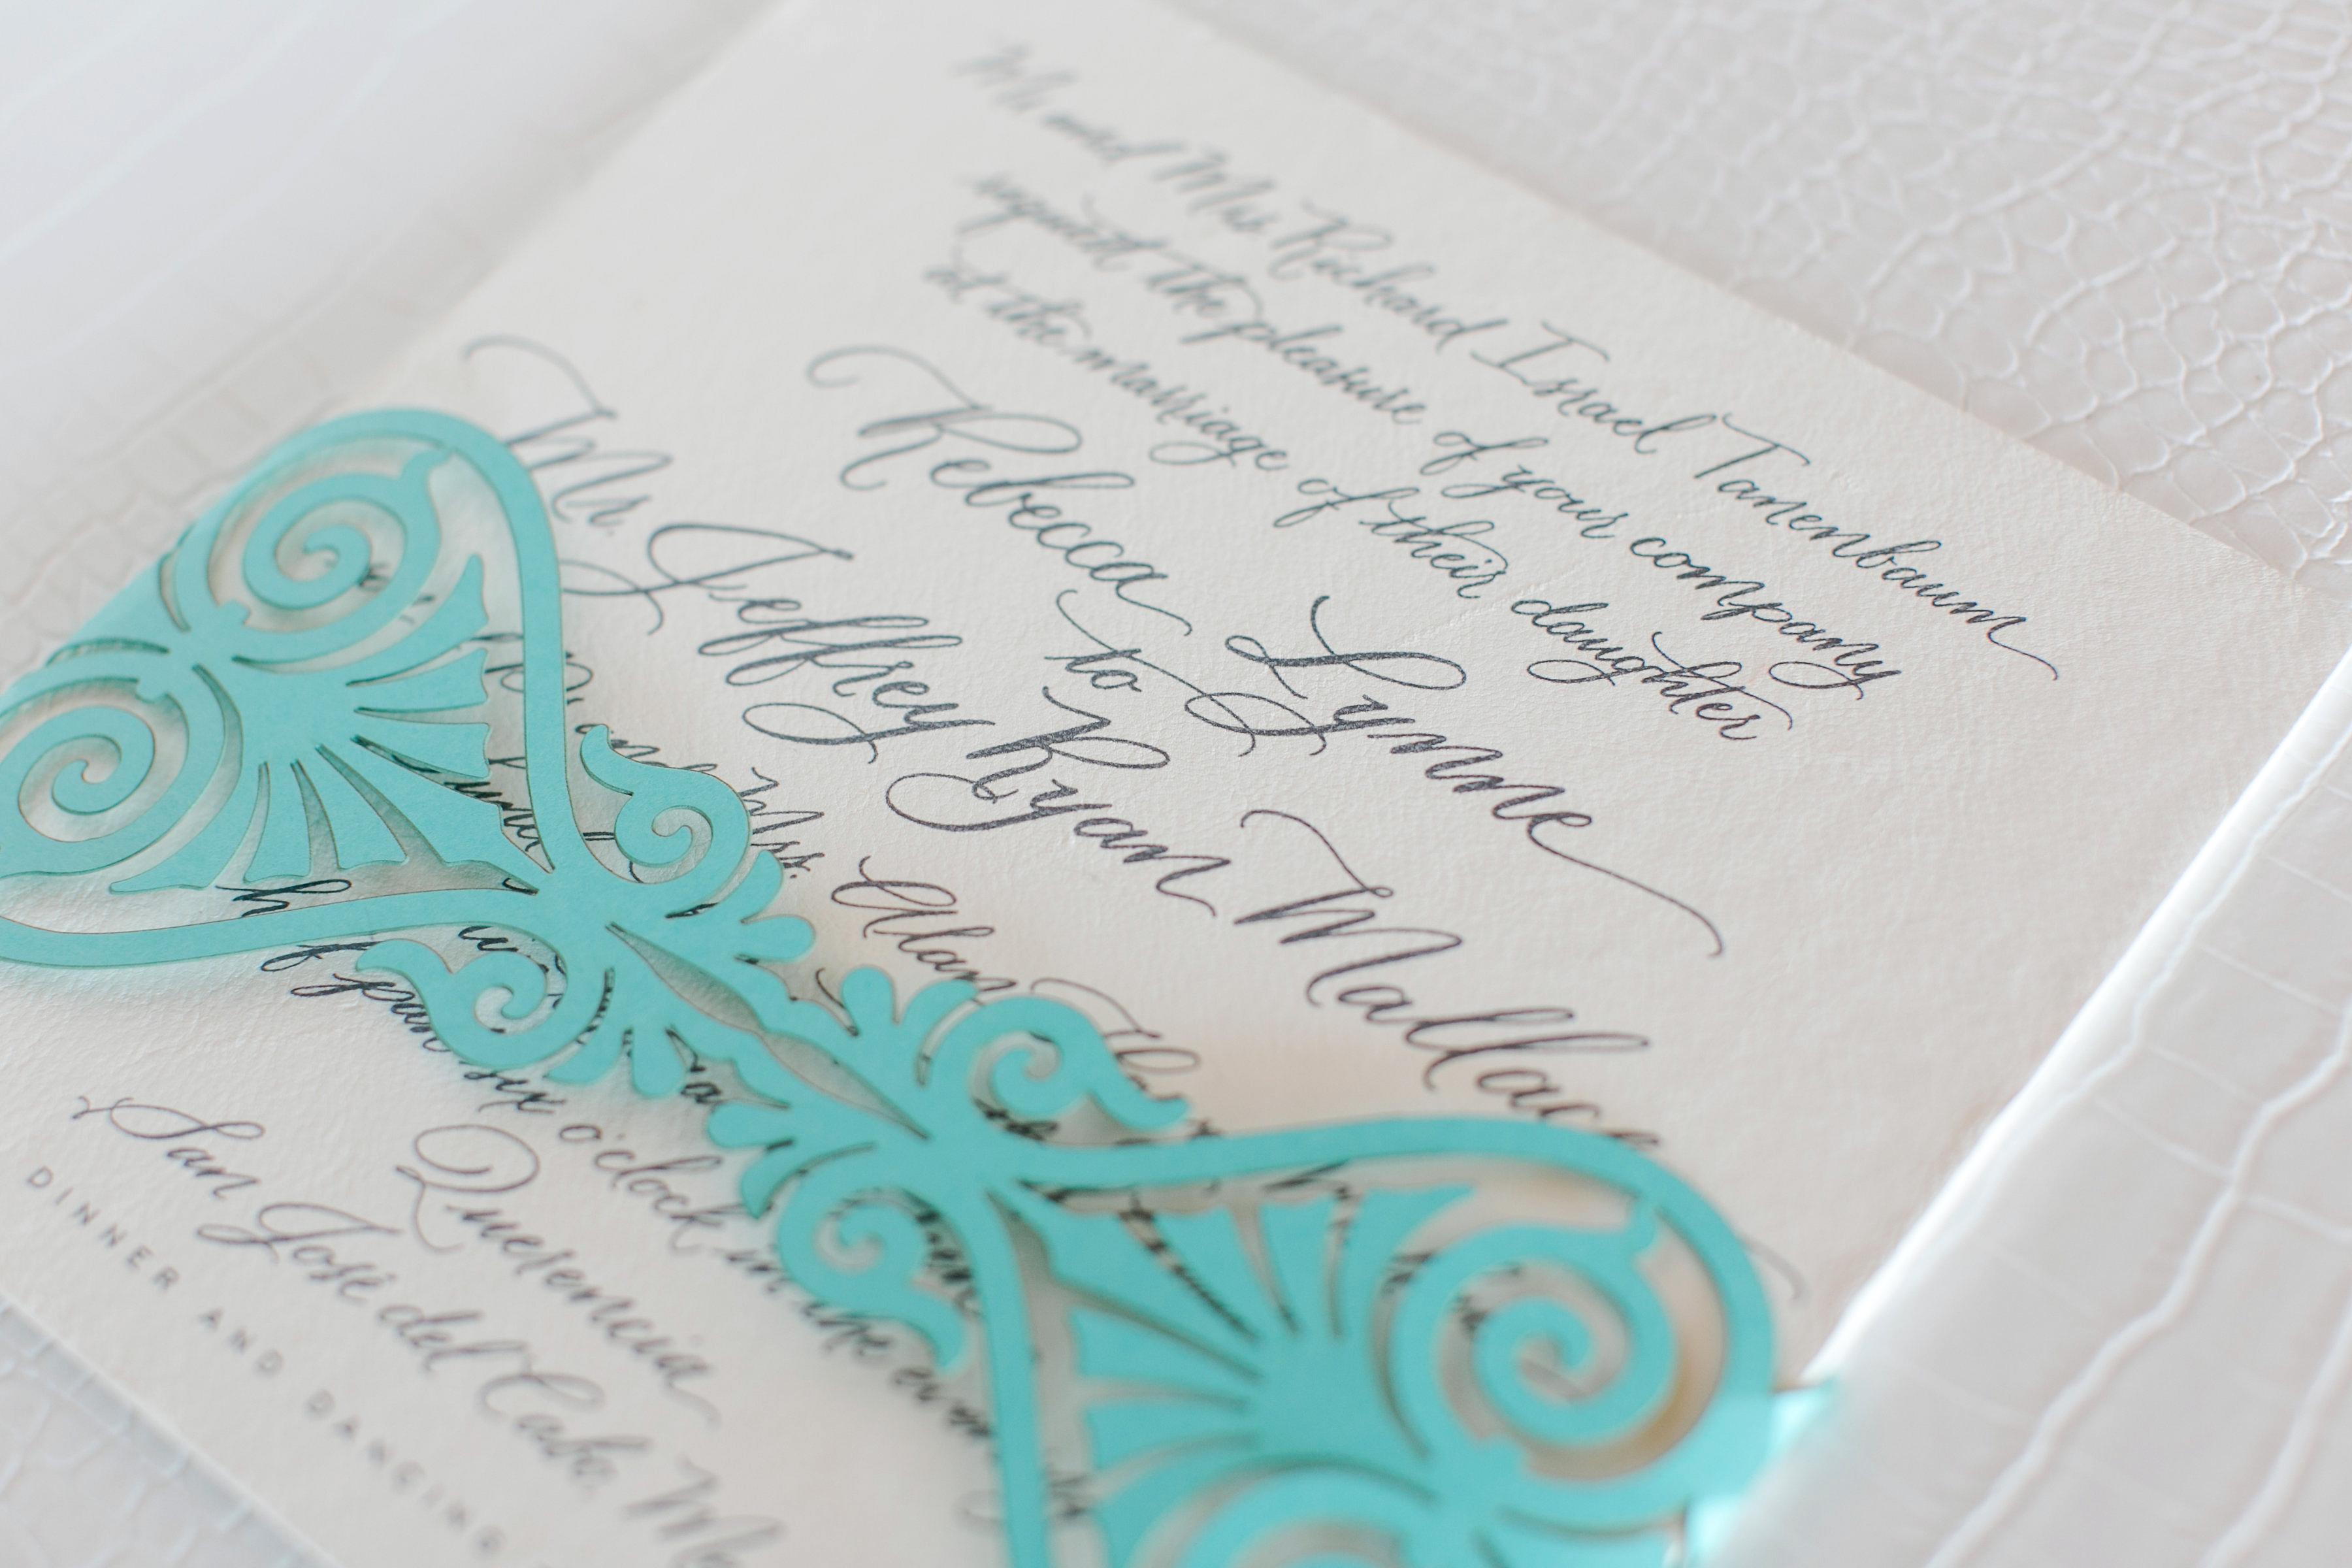 invitation protocol communicate effectively